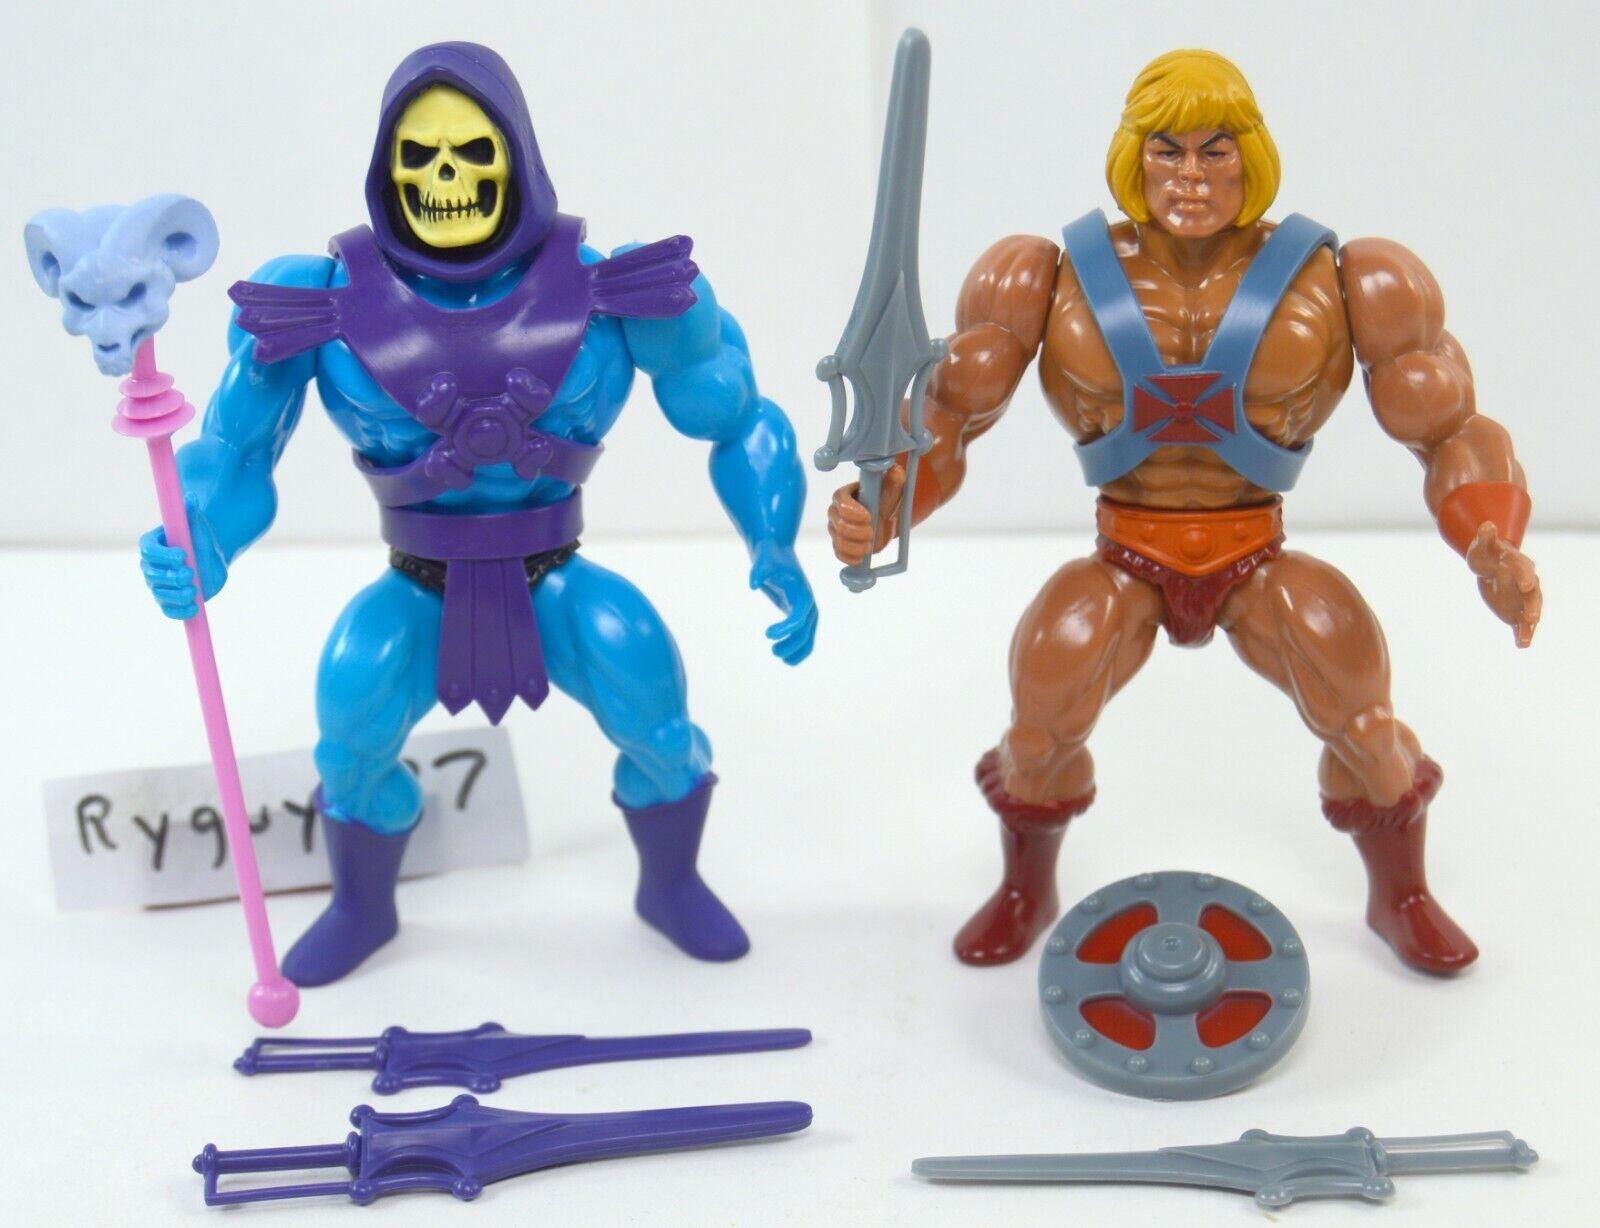 MOTU, He-Man & Skeletor Filmation Style, Masters of the Universe, Super7, figure